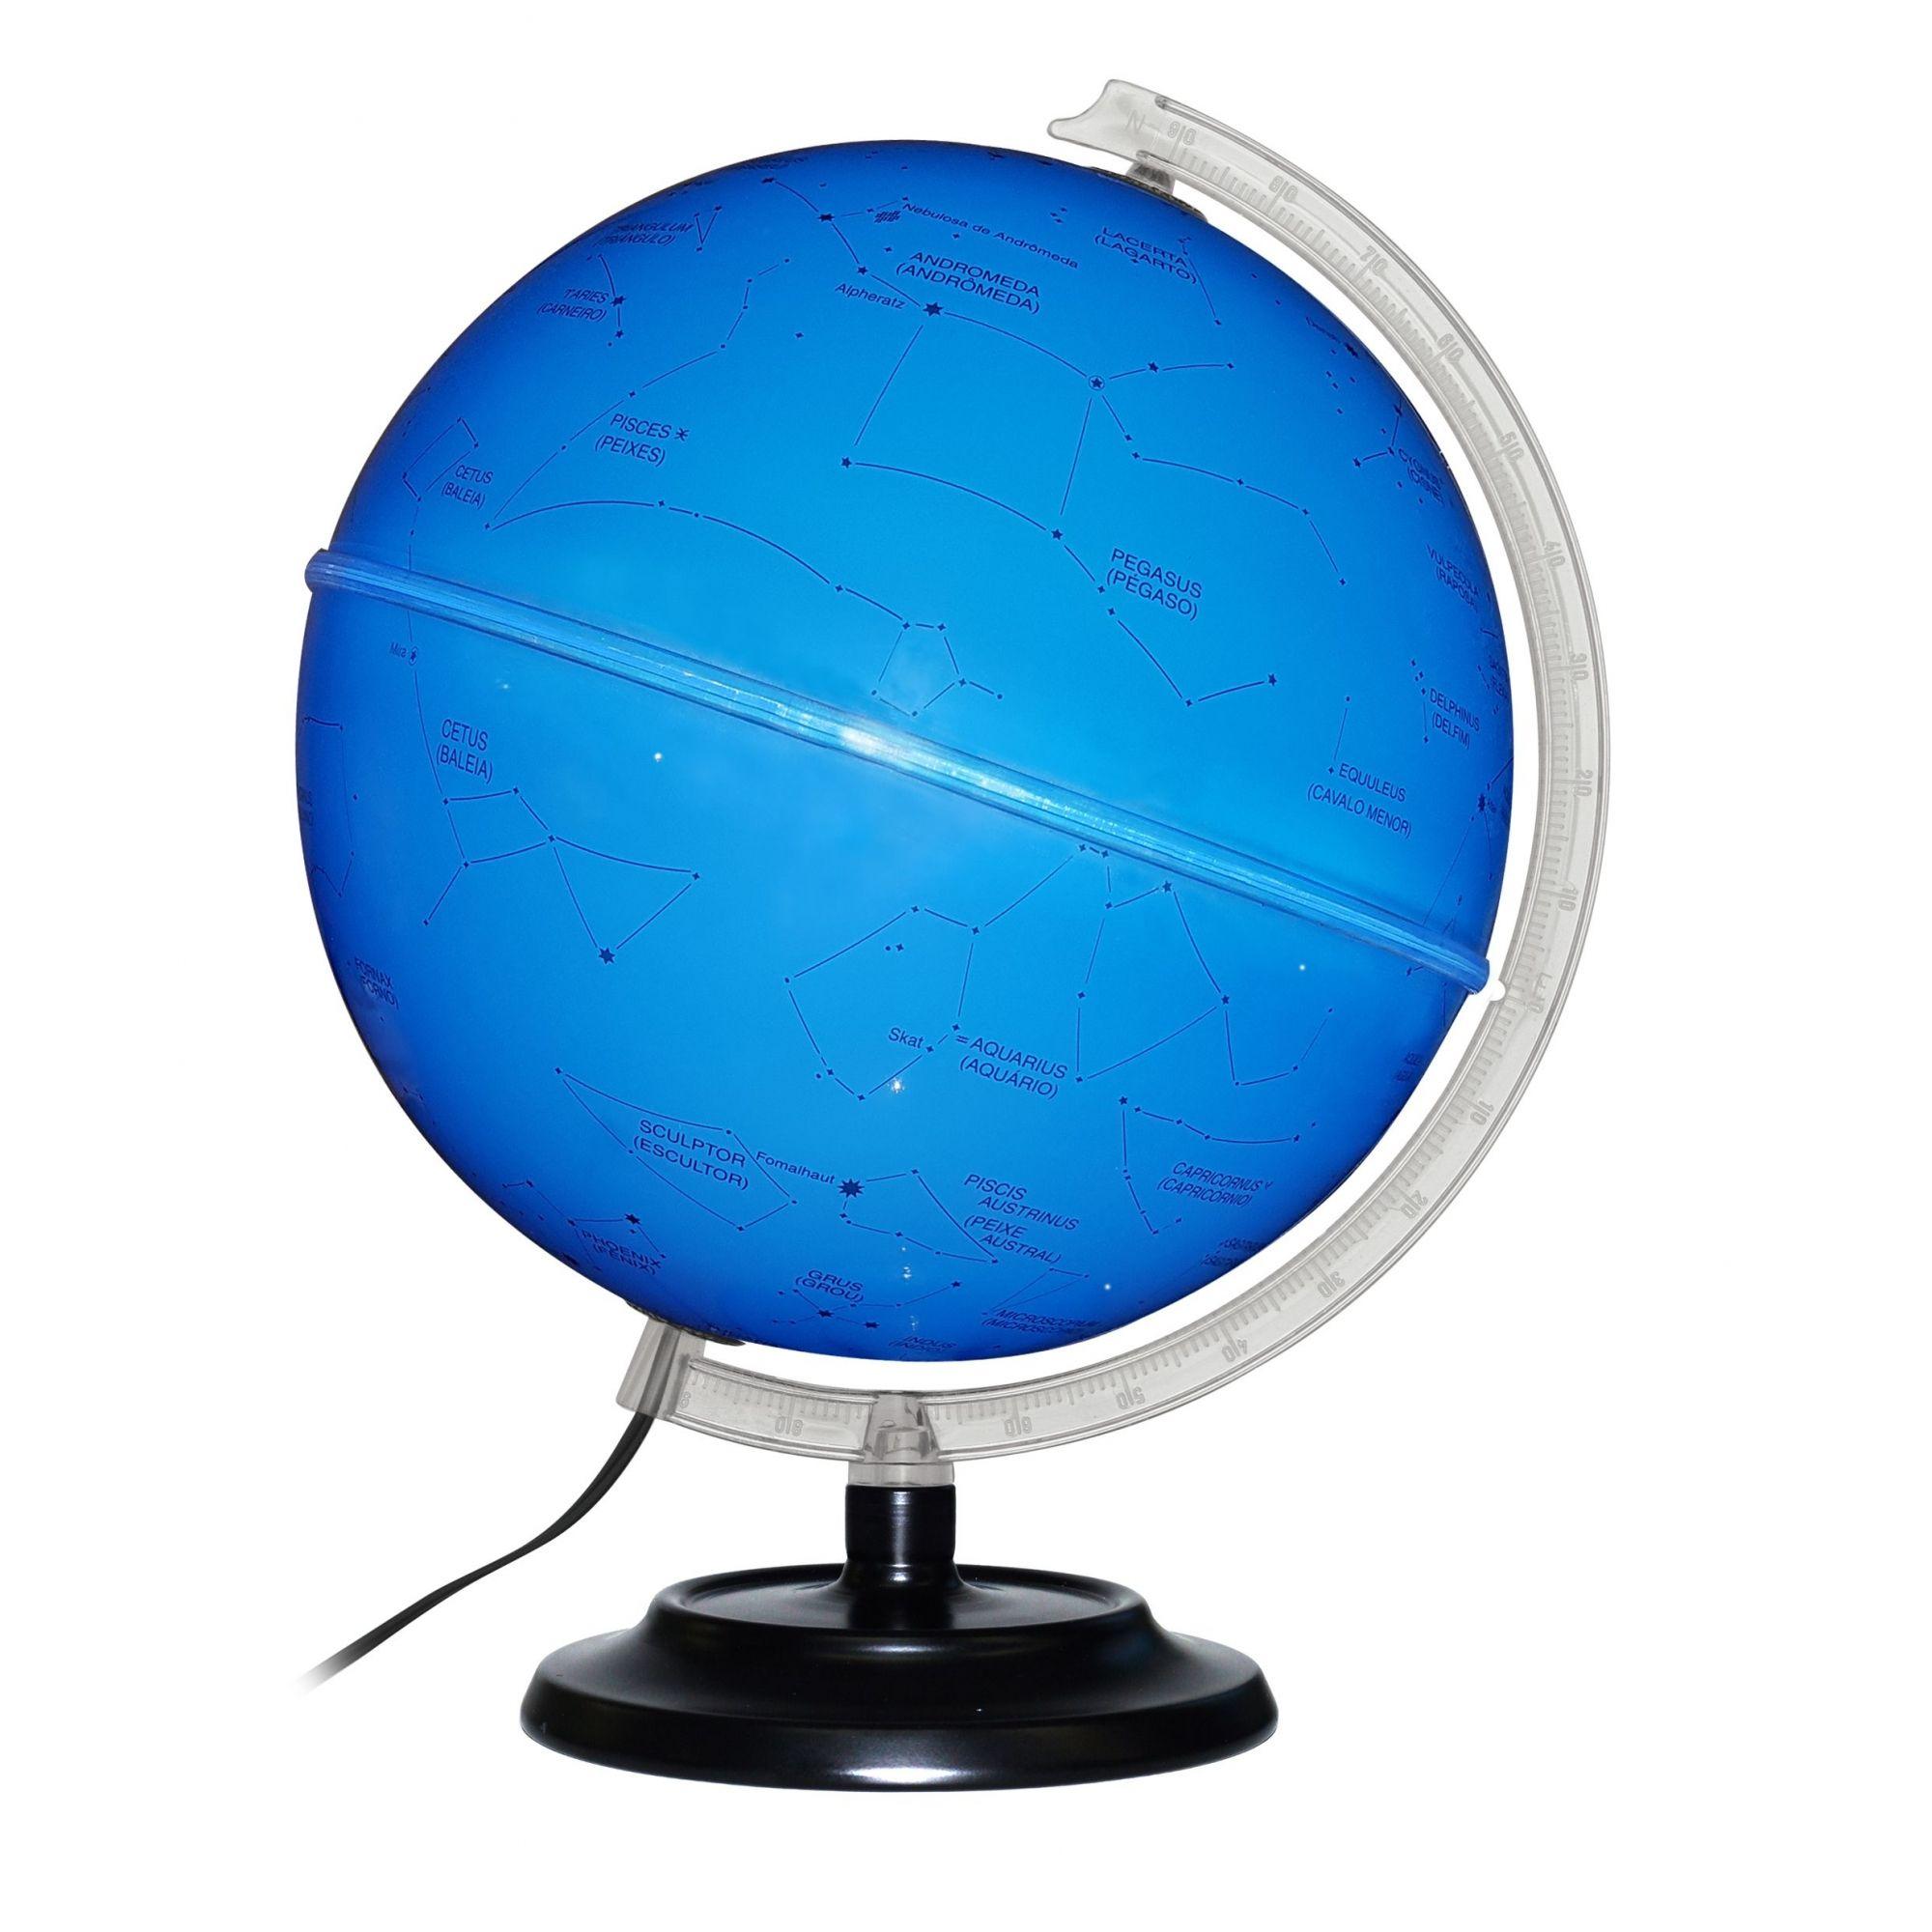 Globo Celeste Libreria 30cm Cielo 30I-Azul-Lb/Bs-F 313048 Estrelas Bivolt Base Ferro Preta